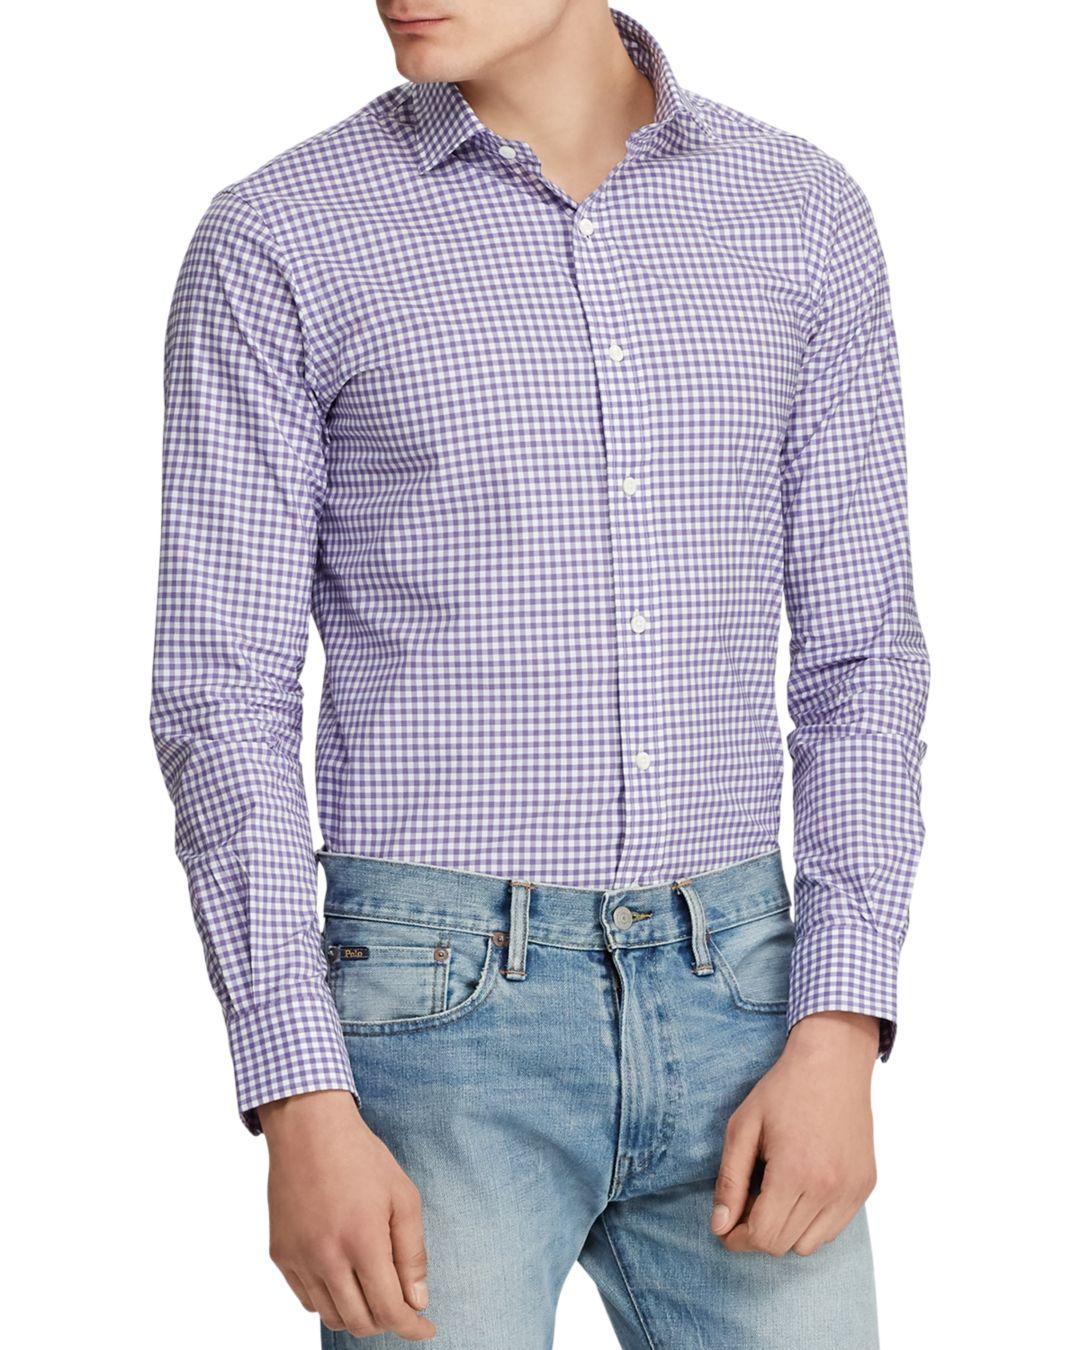 c4d22ae28f Lyst - Polo Ralph Lauren Classic Fit Poplin Shirt in Purple for Men